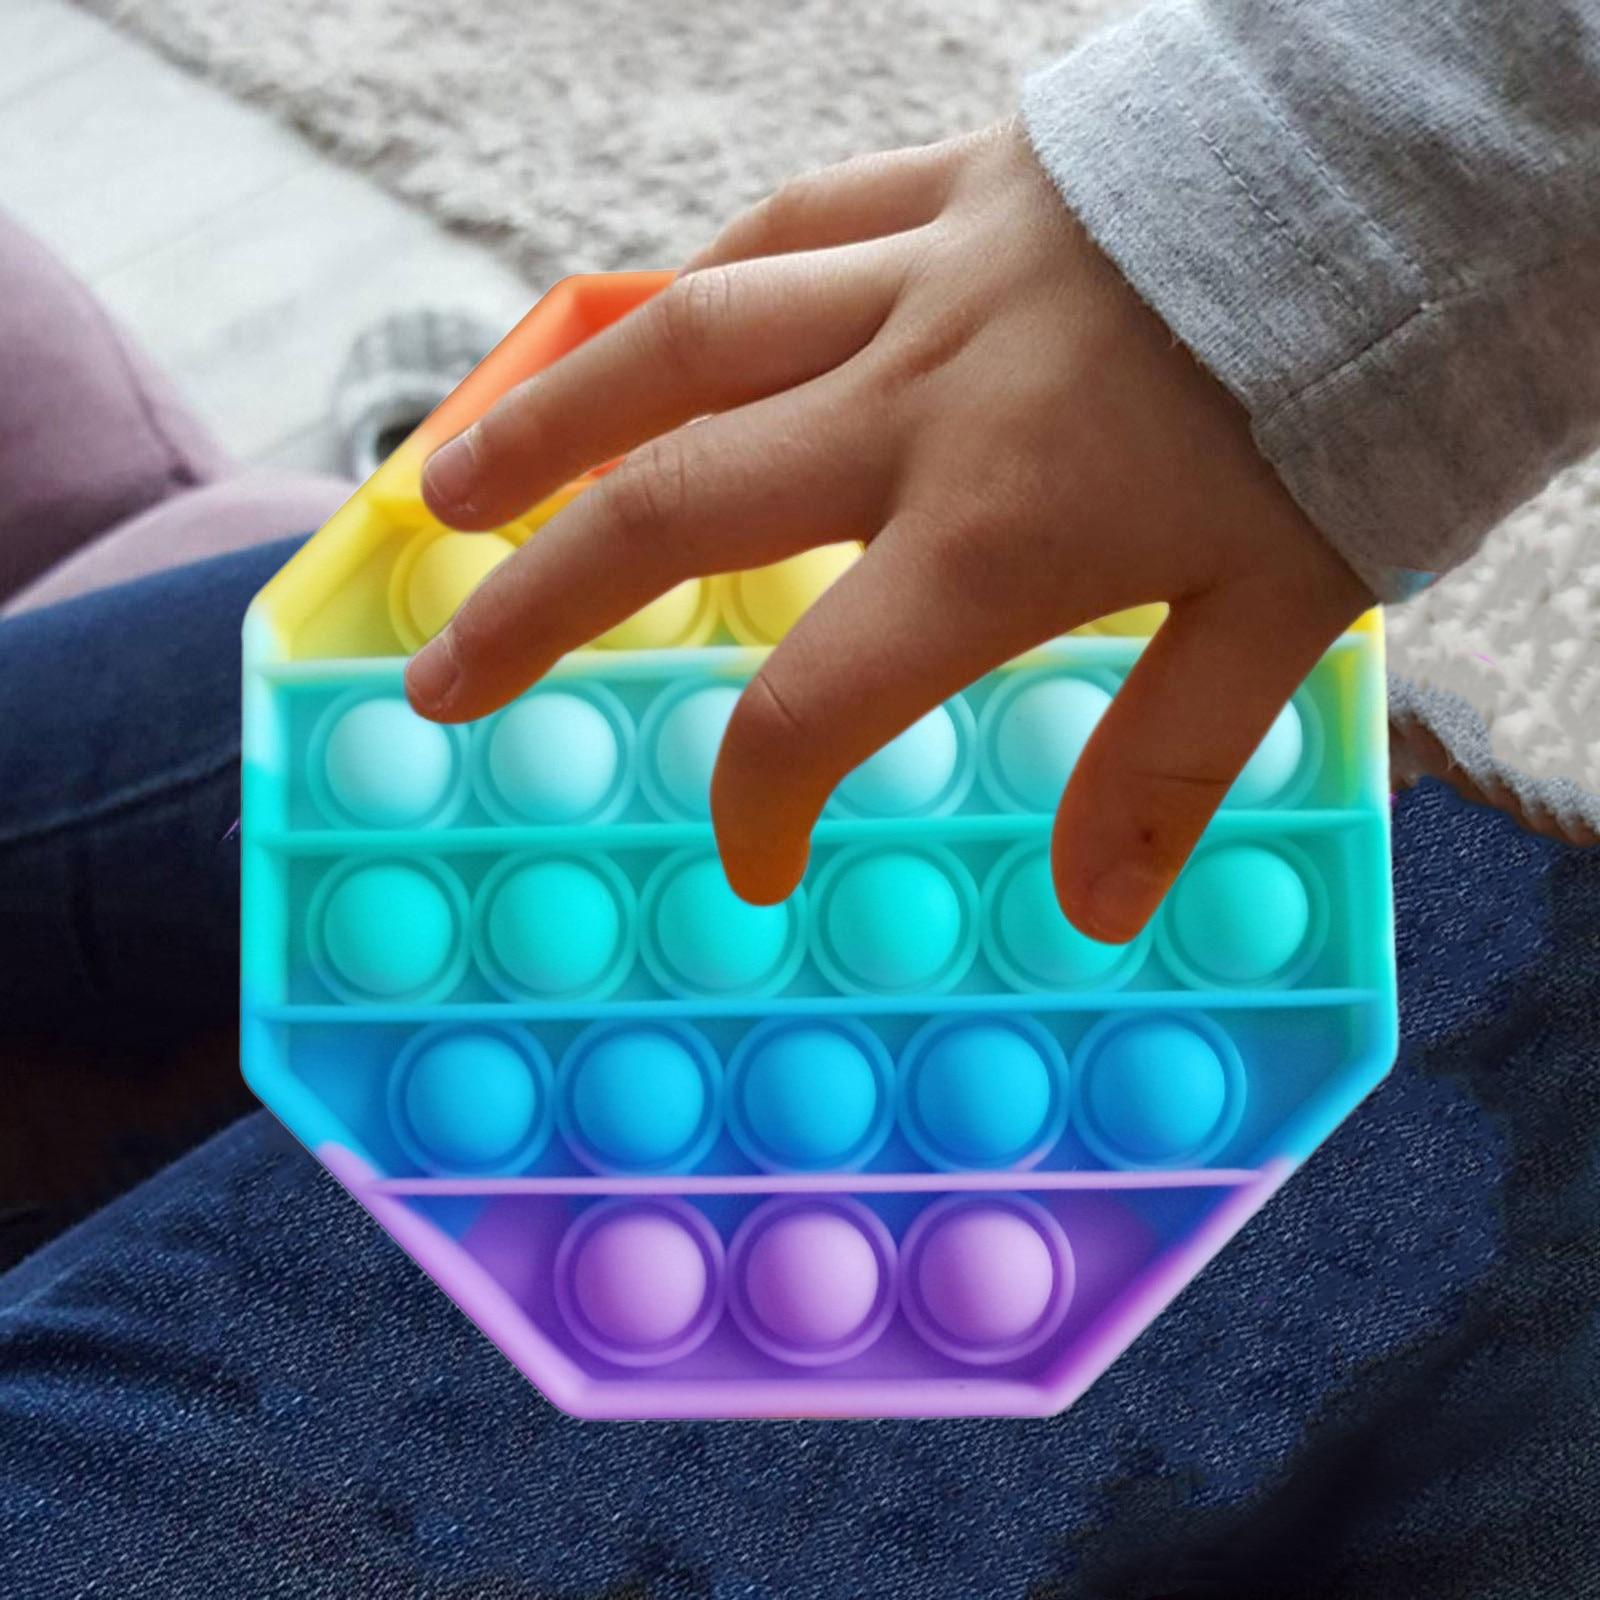 Adult Toys Autism Fidget Bubble-Sensory Anti-Stress Squishy Pop-It Push-Pops Needs Rainbow img2